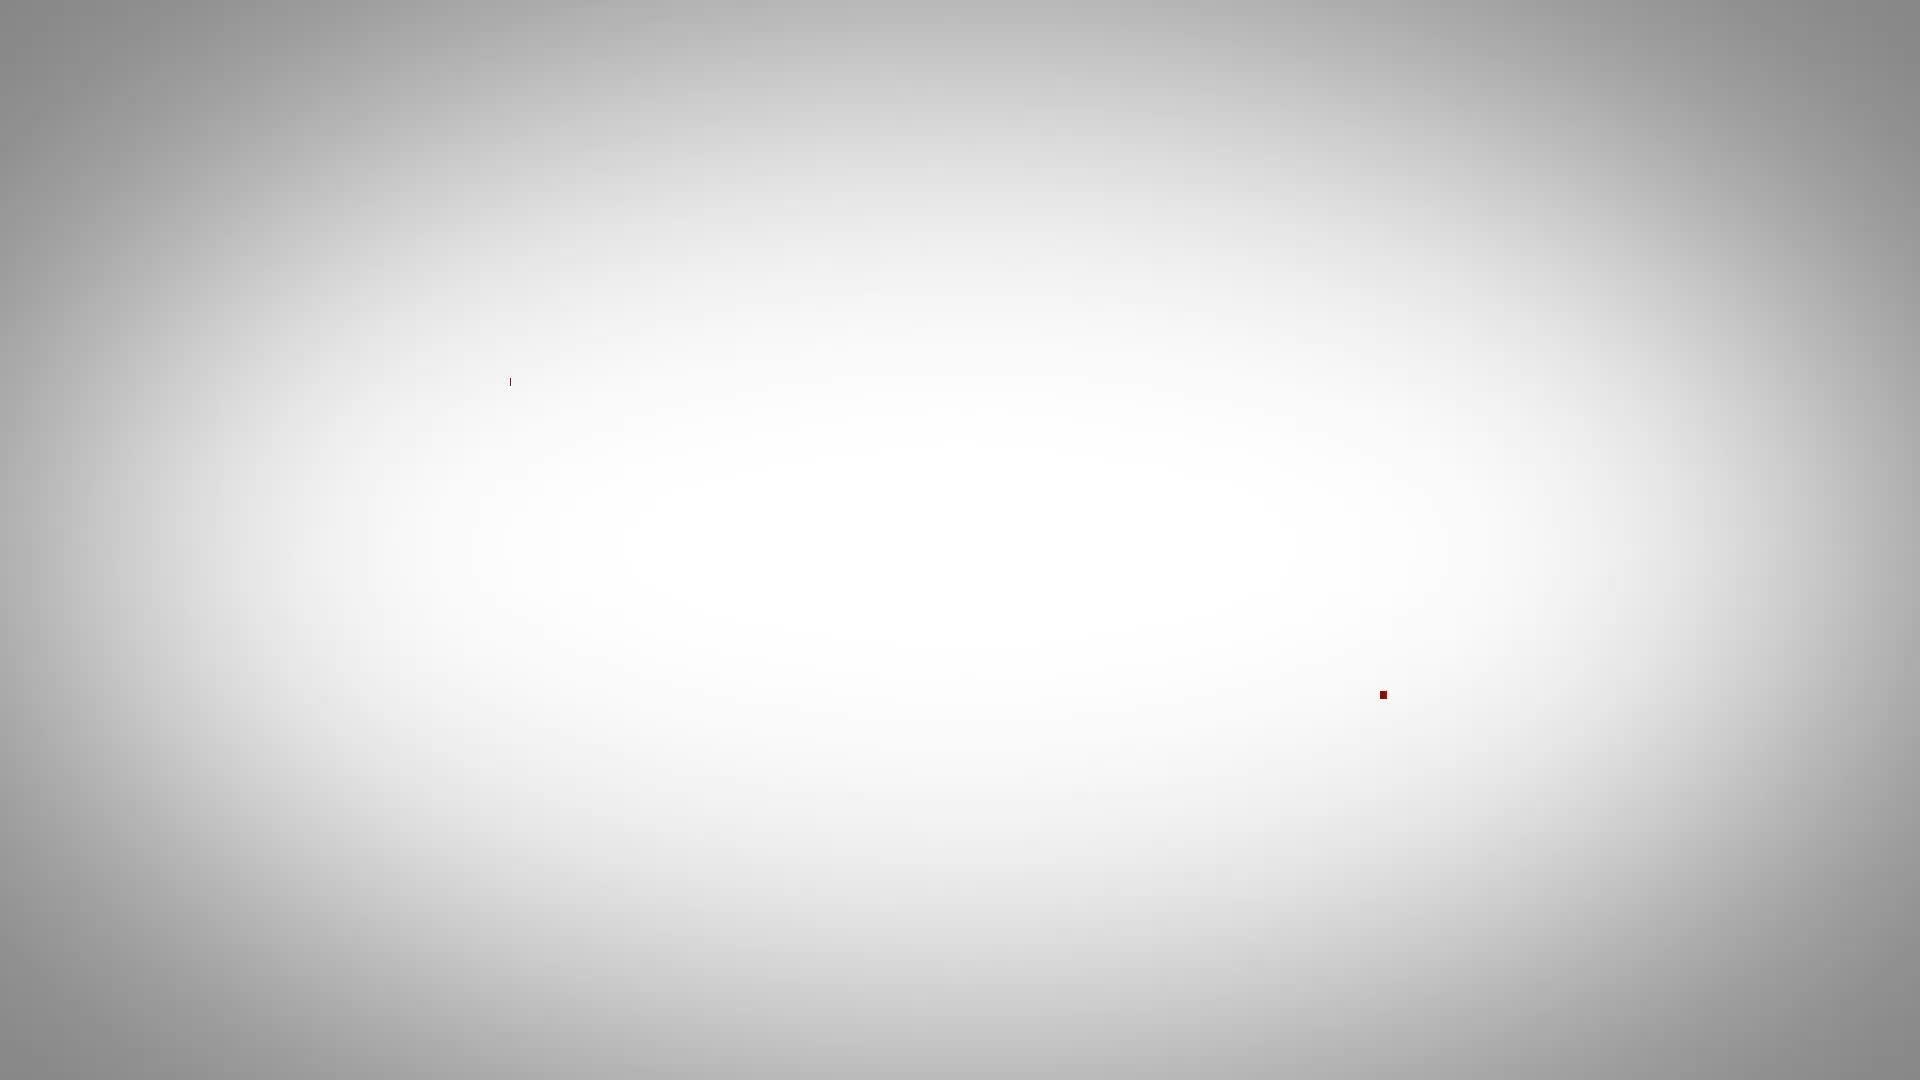 Image of ਆਪ ਦੇ ਮੈਂਬਰ ਪਾਰਲੀਮੈਂਟ ਨੇ ਗੋਦ ਲਏ ਪਿੰਡ ਨਾਲ ਕੀਤਾ ਮਜ਼ਾਕ!